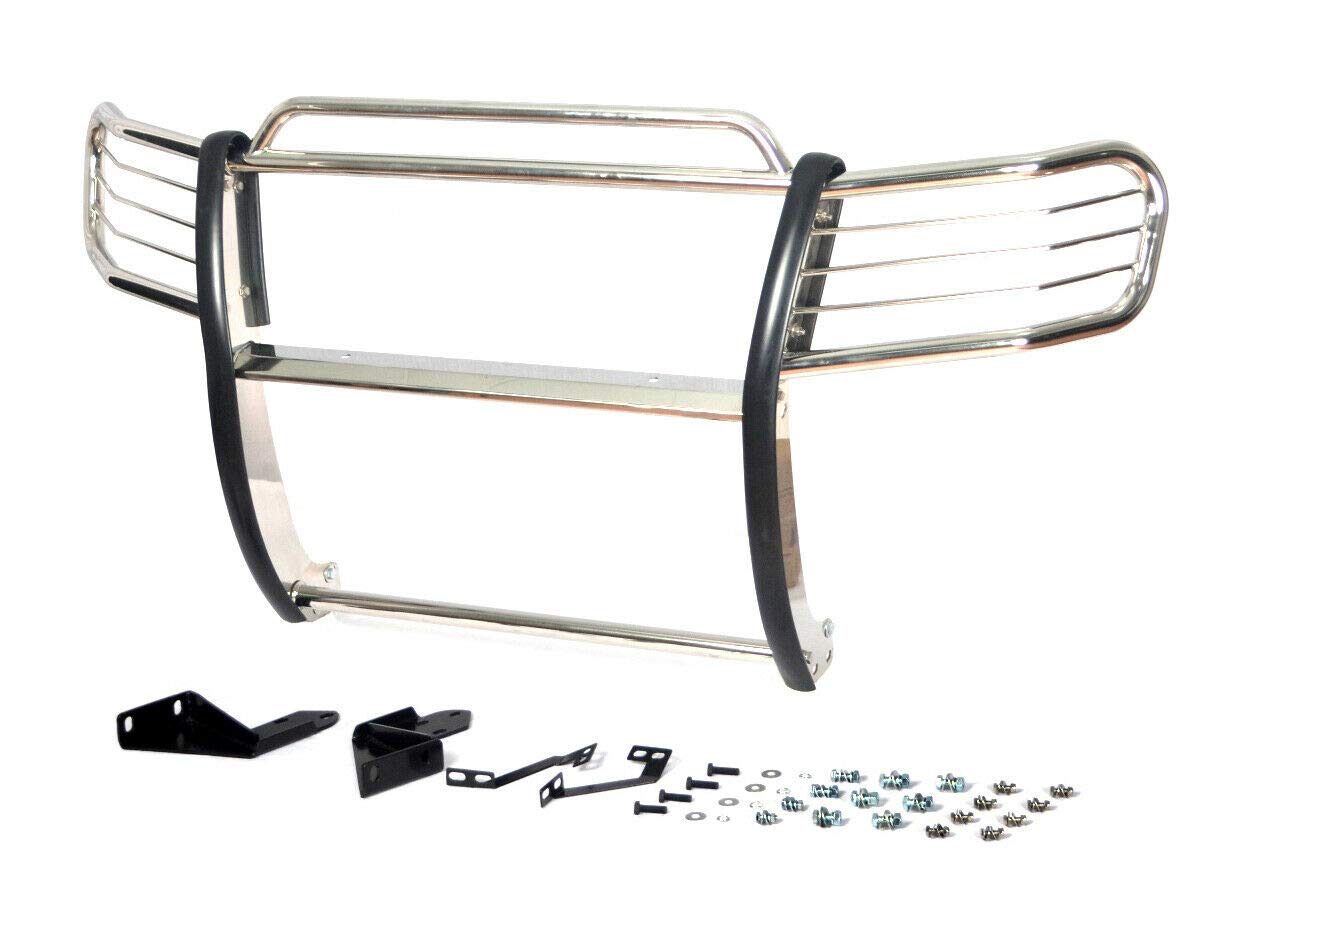 Hunter Premium Truck Accessories Stainless Steel Grille Guard Fits 05-08 Nissan Xterra